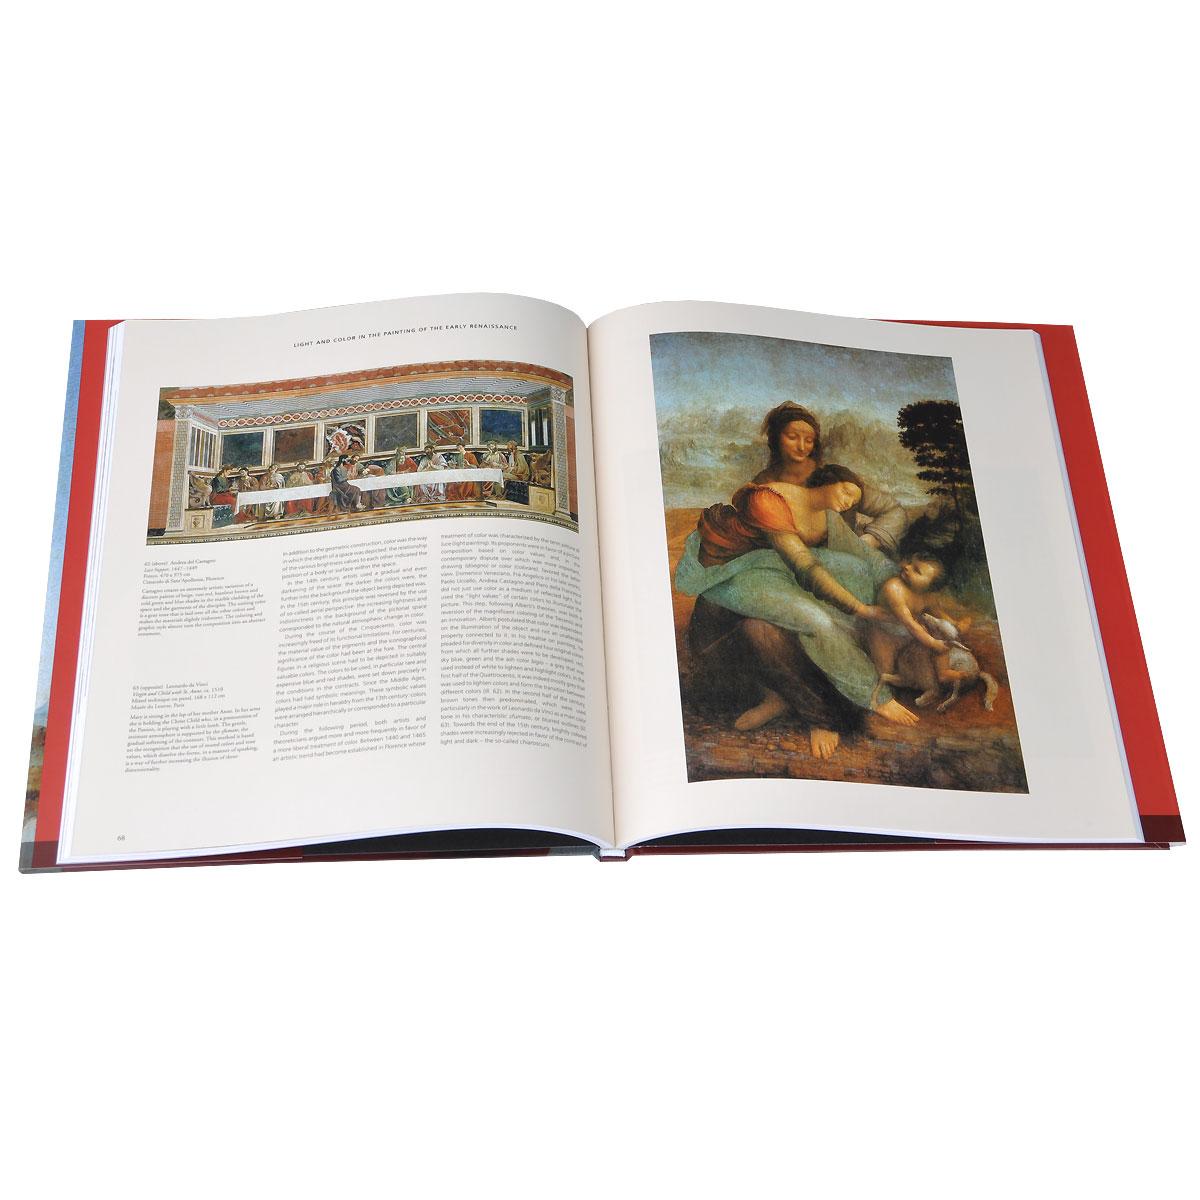 Piero della Francesca: Masters of Italian Art